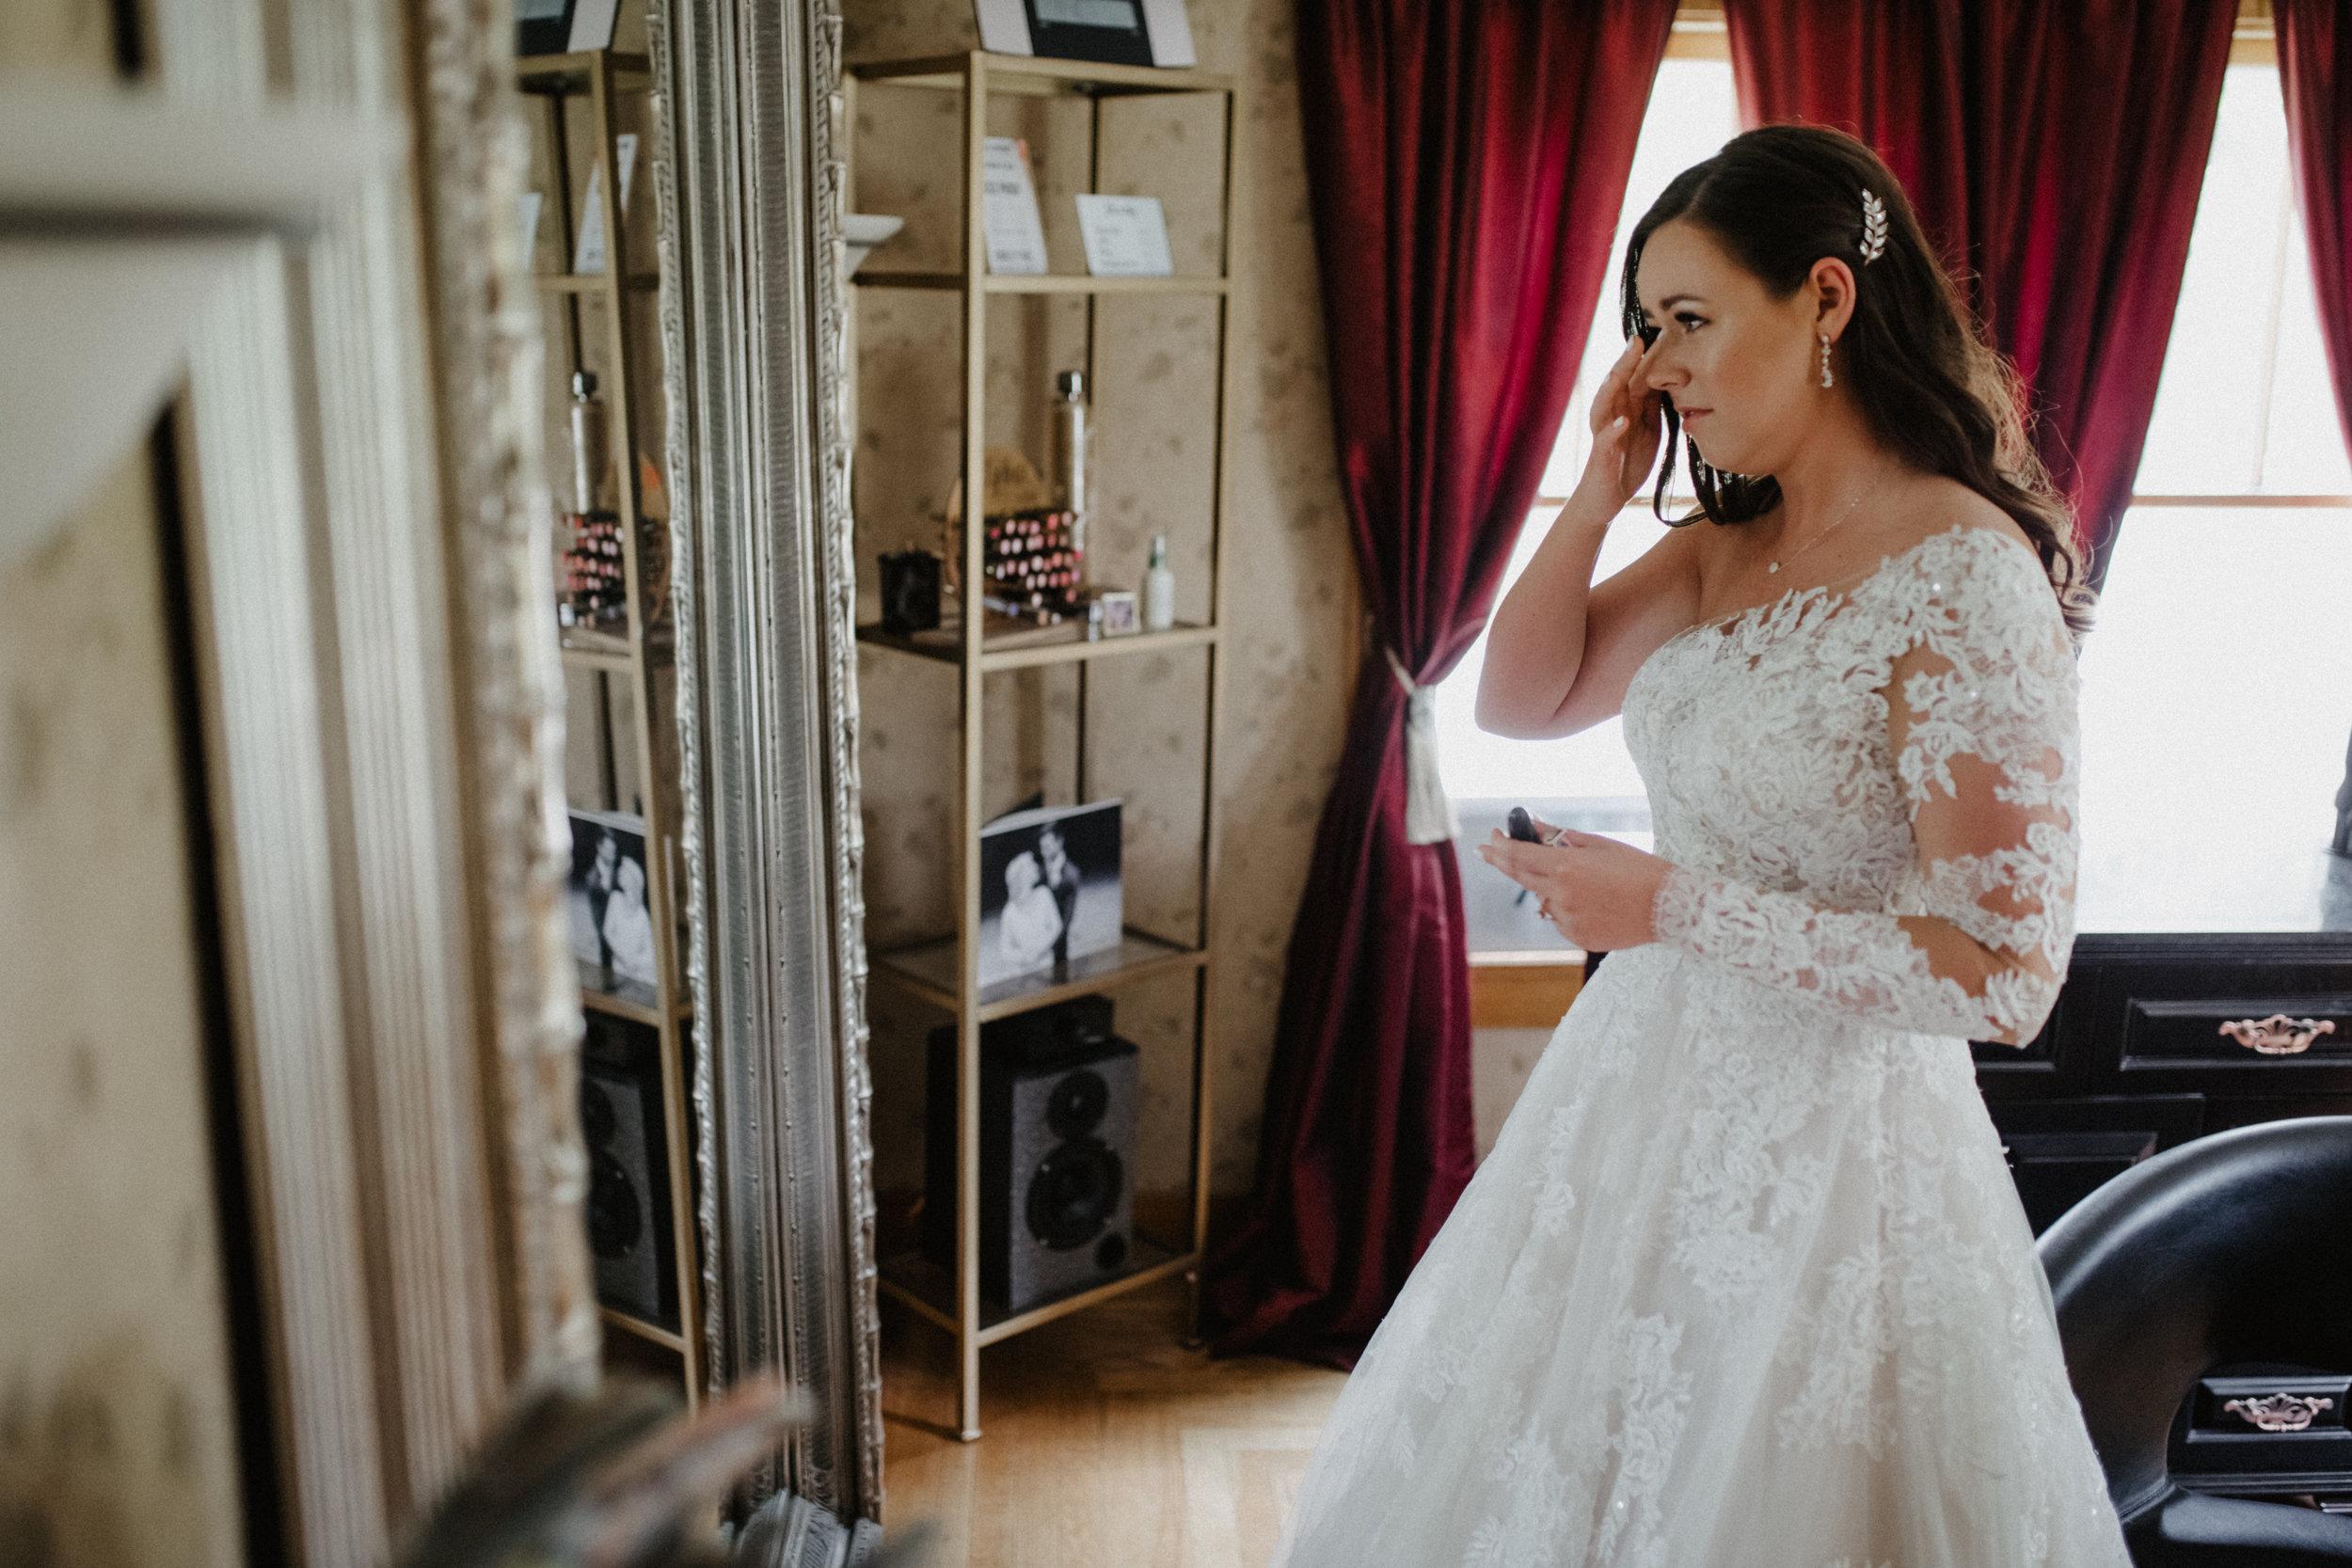 GRAYCENTOMHAMILTON-GRAND-RAPIDS-WEDDING-PHOTOGRAPHY-13.jpg